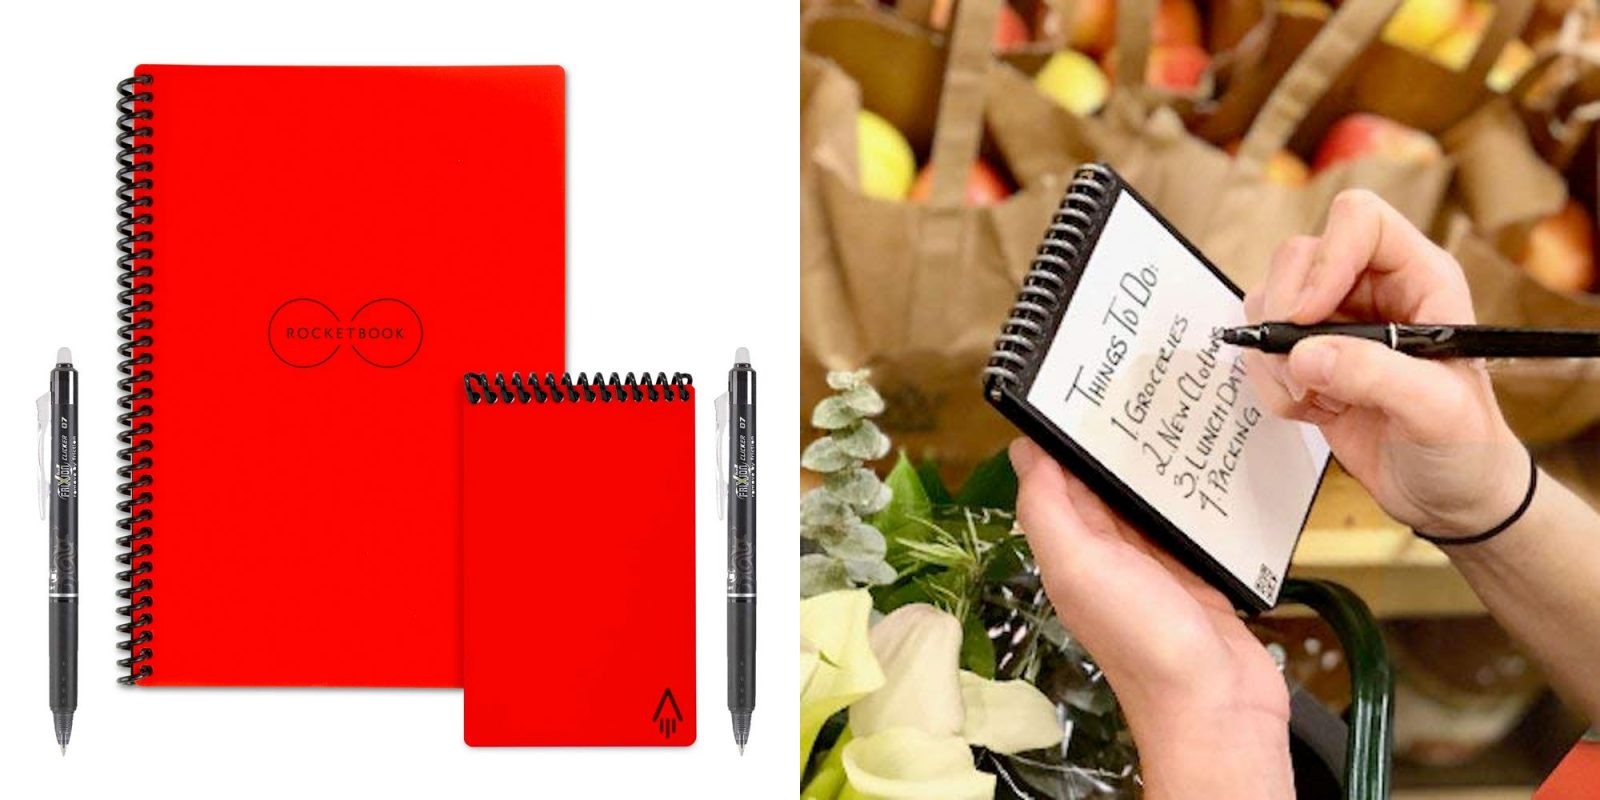 Get Rocketbook's erasable notebook w/ 2 pens & multiple sizes: $38 (Reg. $48)